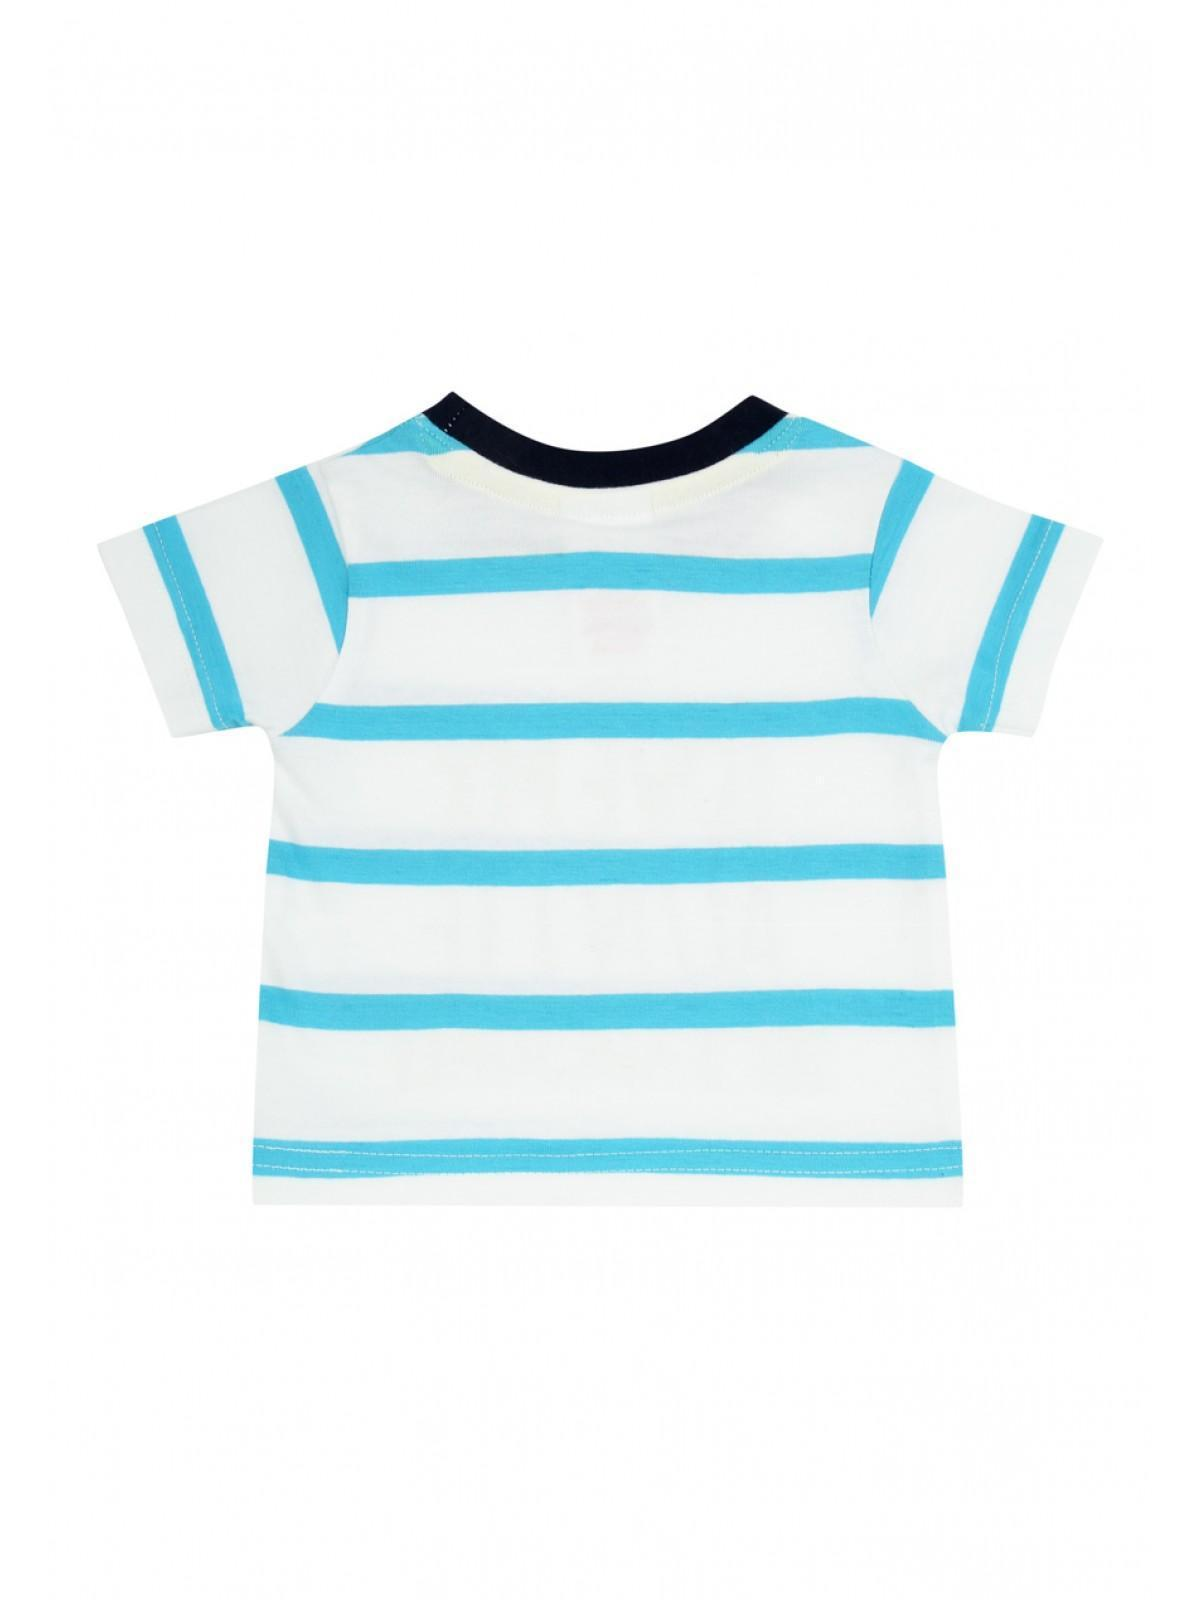 Boys aby Boys Aqua Auntie T Shirt